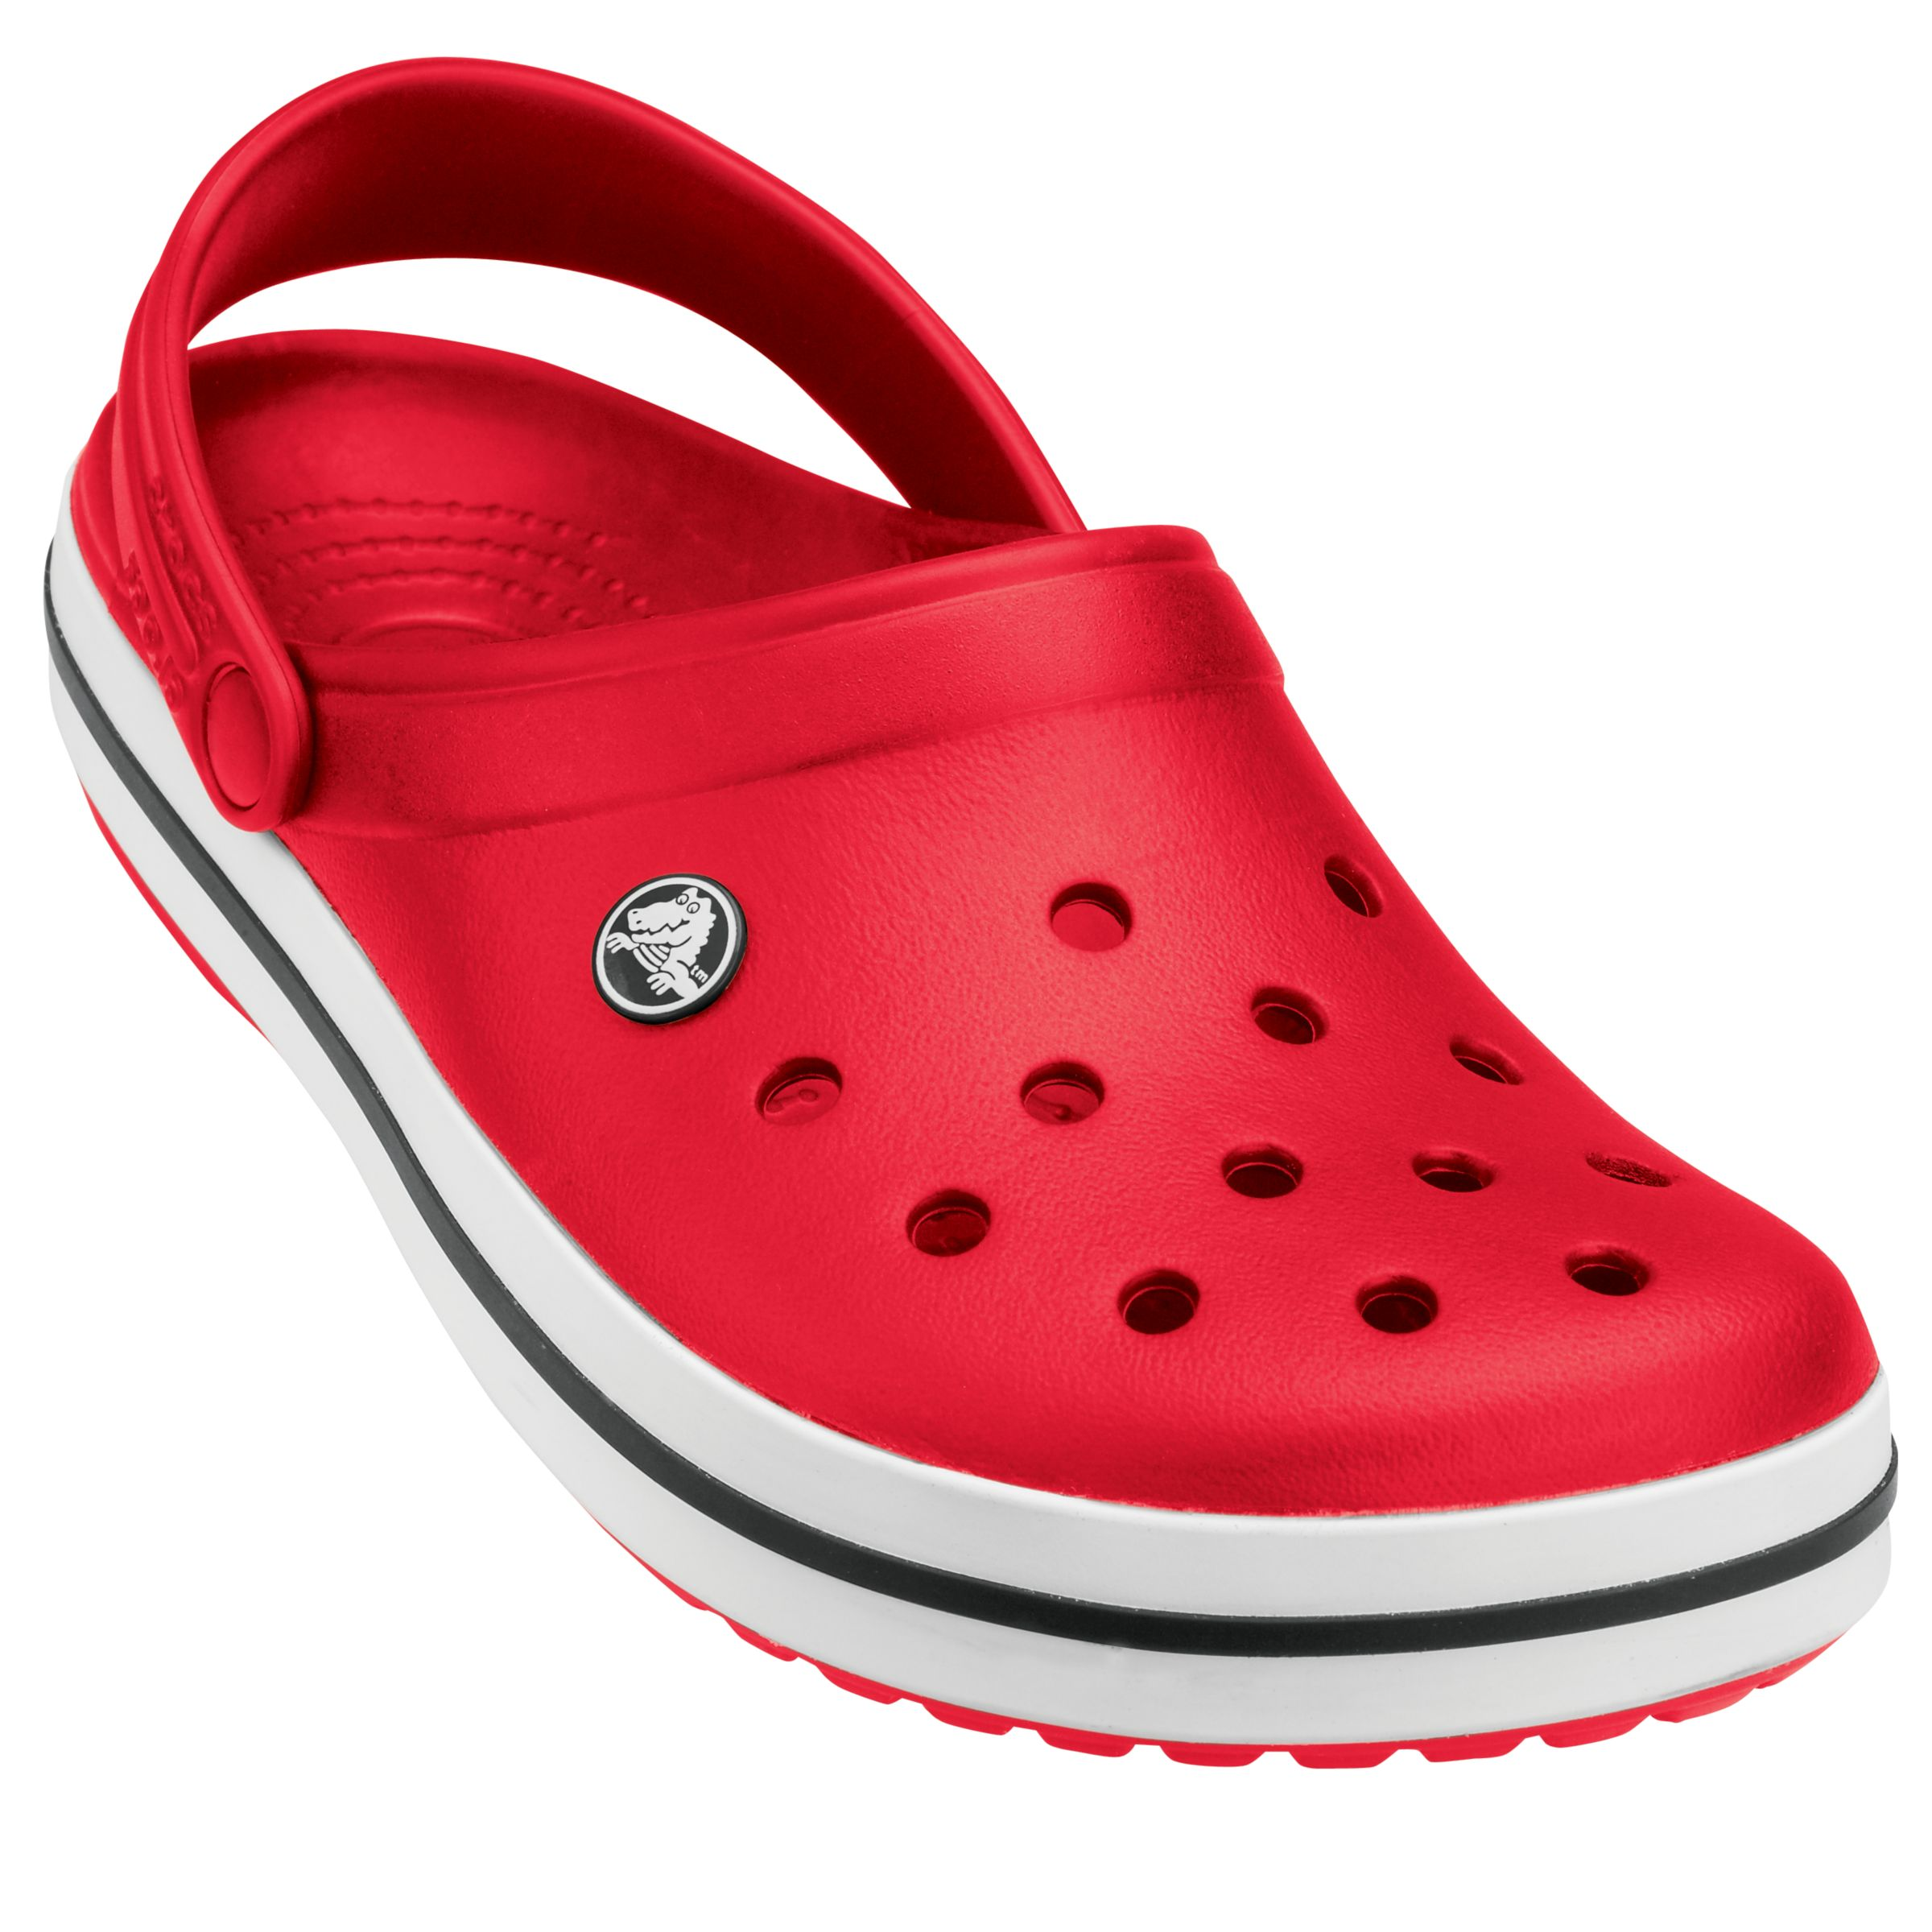 Crocs Crocband Sandals, Red 362575